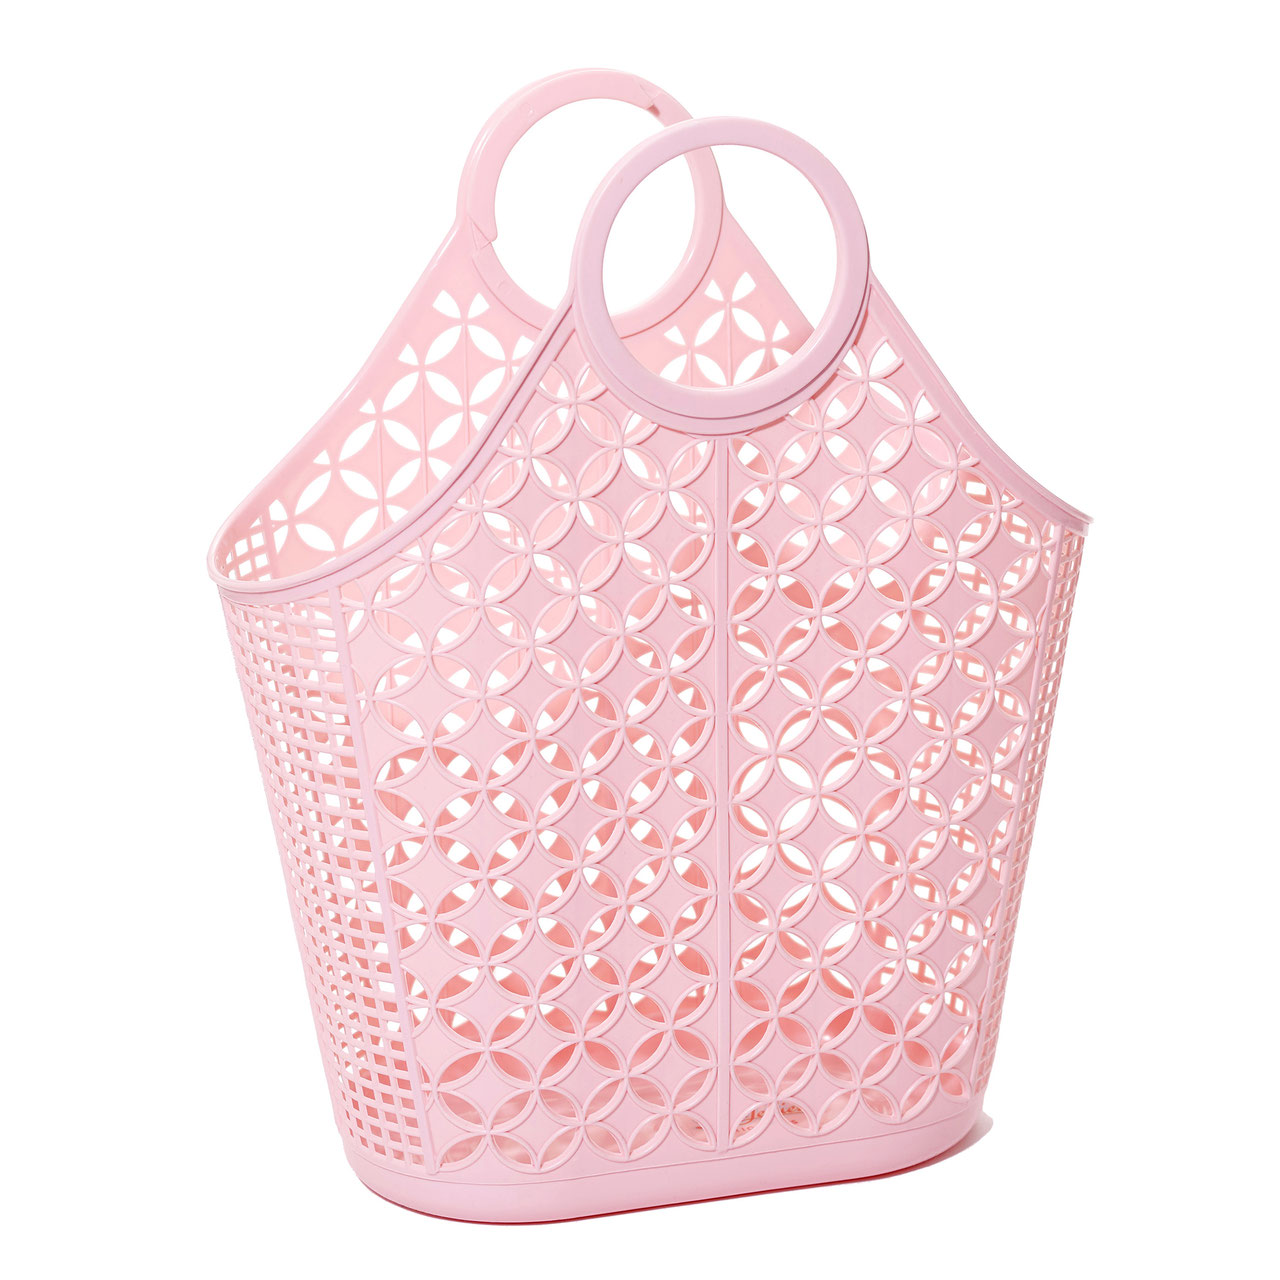 Sun Jellies Atomic Tote – Pink